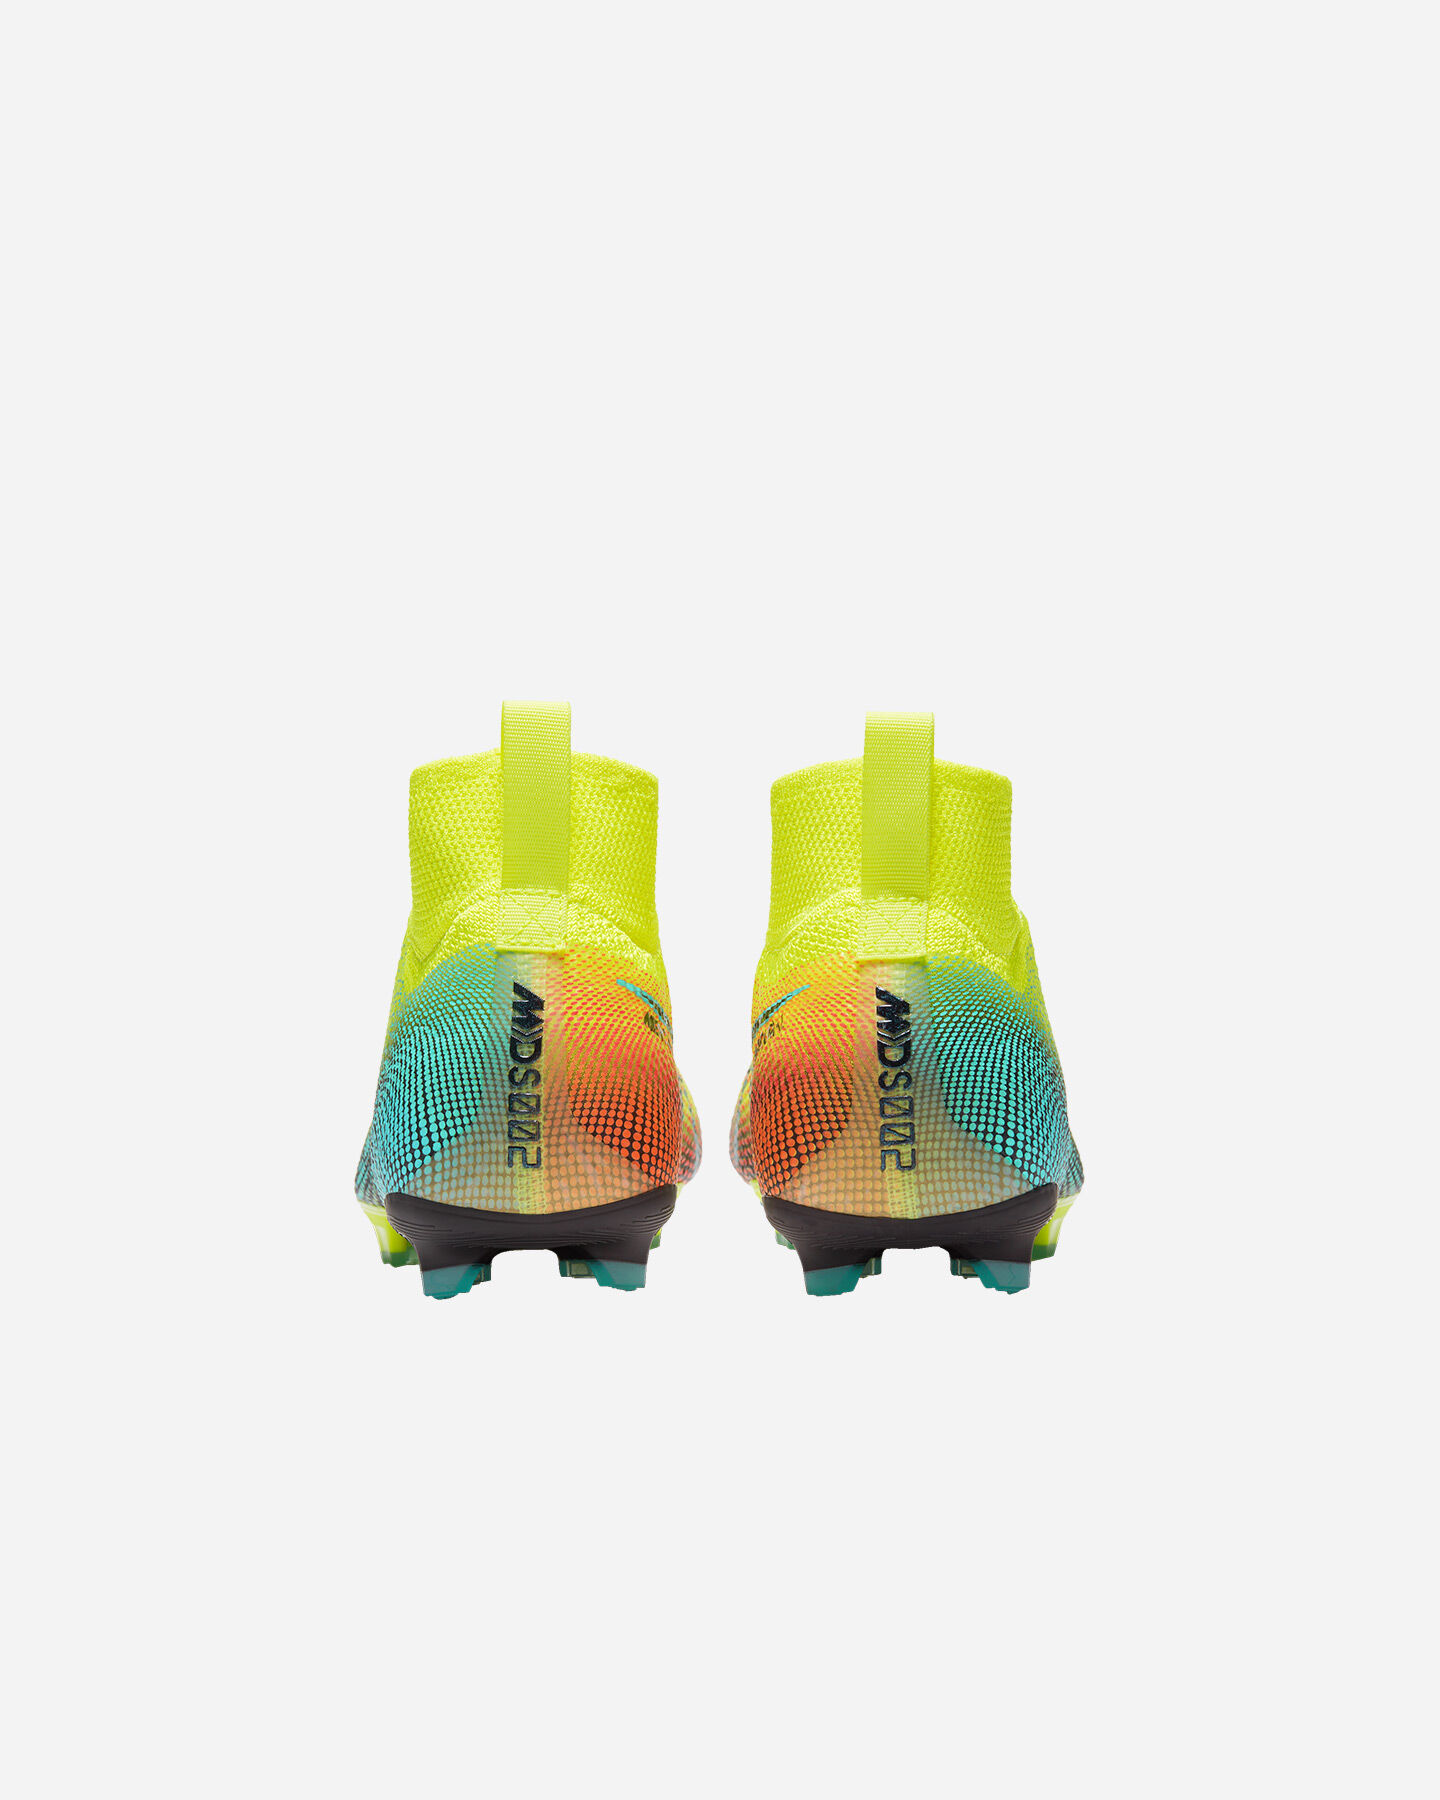 Scarpe calcio NIKE MERCURIAL SUPERFLY 7 ELITE MDS FG JR S5161783 scatto 4